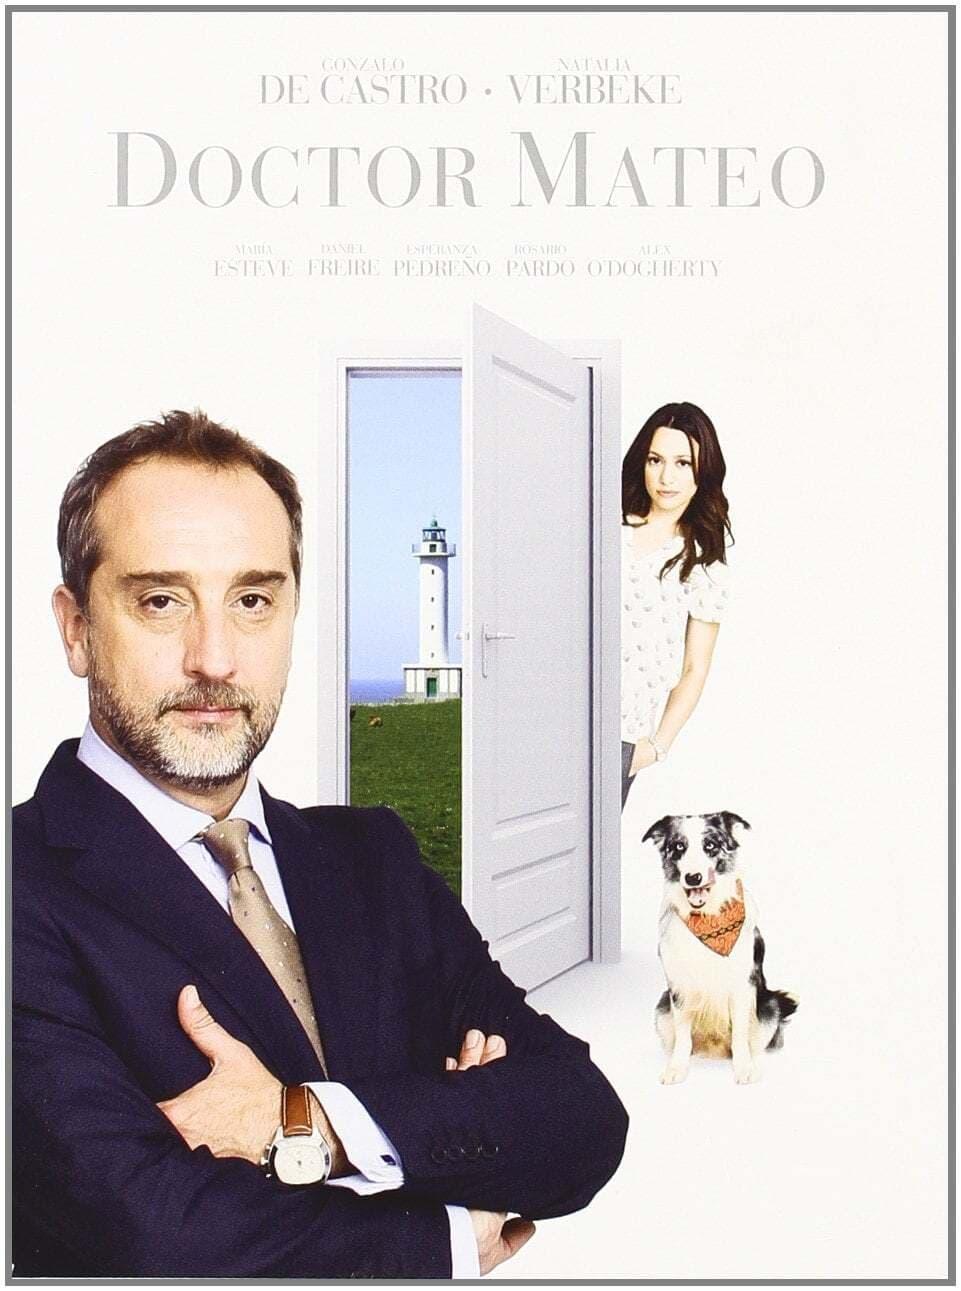 Doctor Mateo